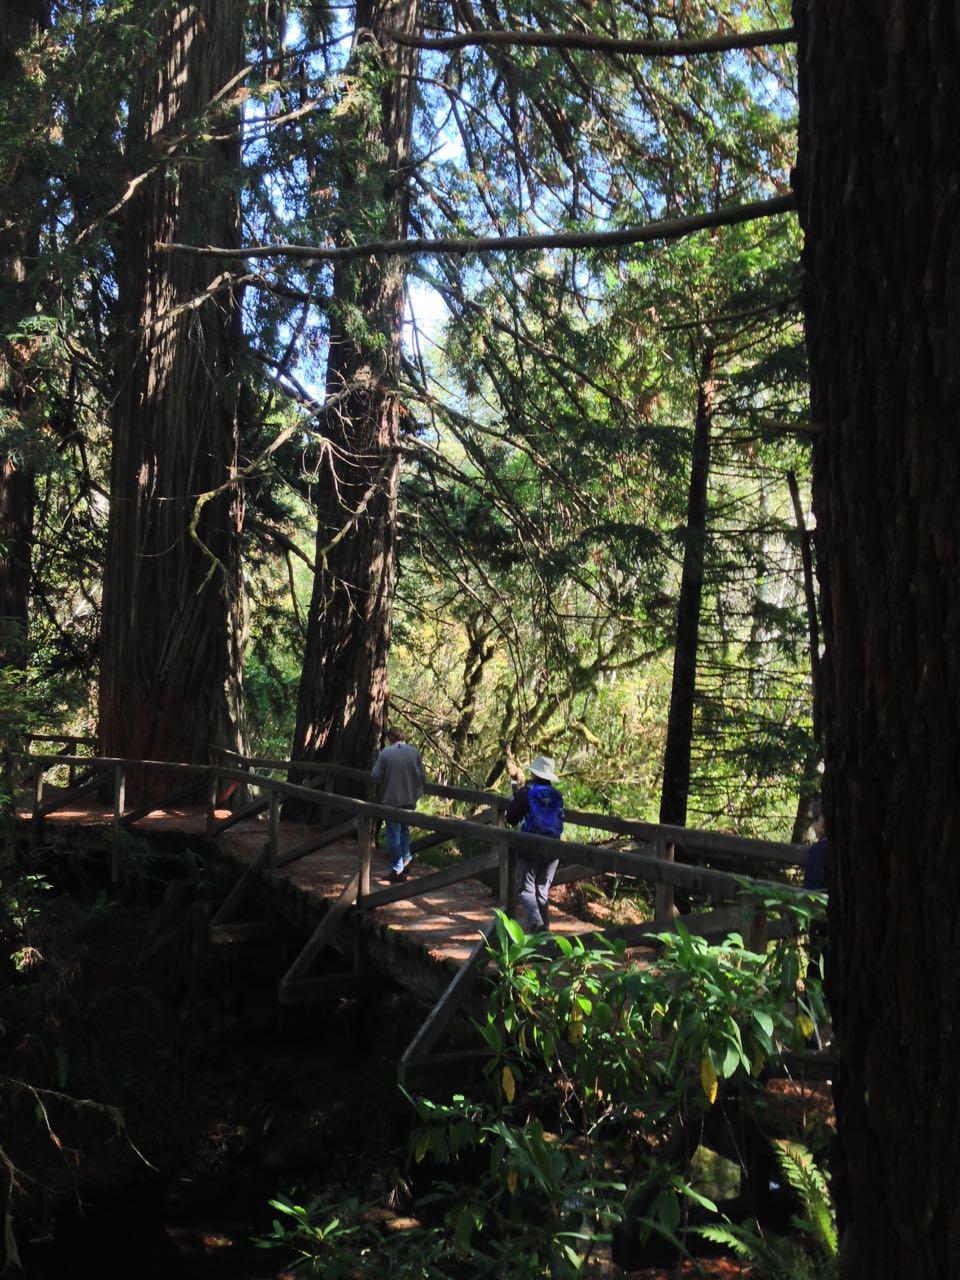 Redwoods 2017 10 08 262 Of 287